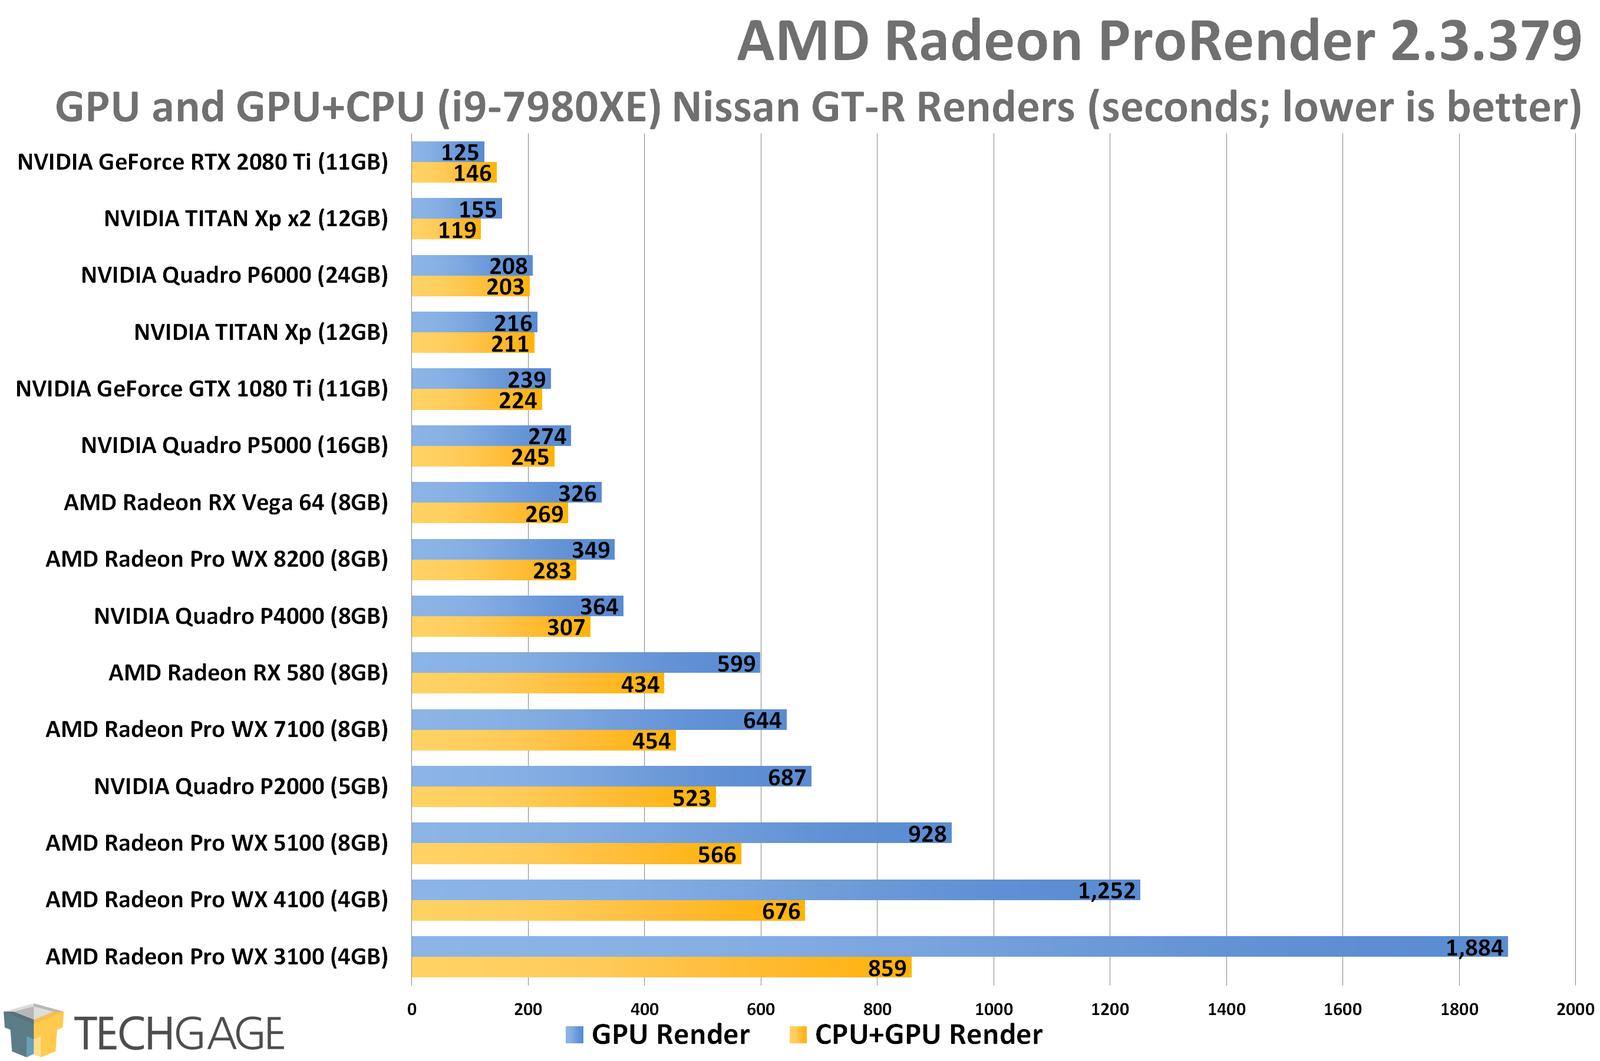 AMD Radeon ProRender: GPU, Multi-GPU & CPU+GPU Rendering Performance